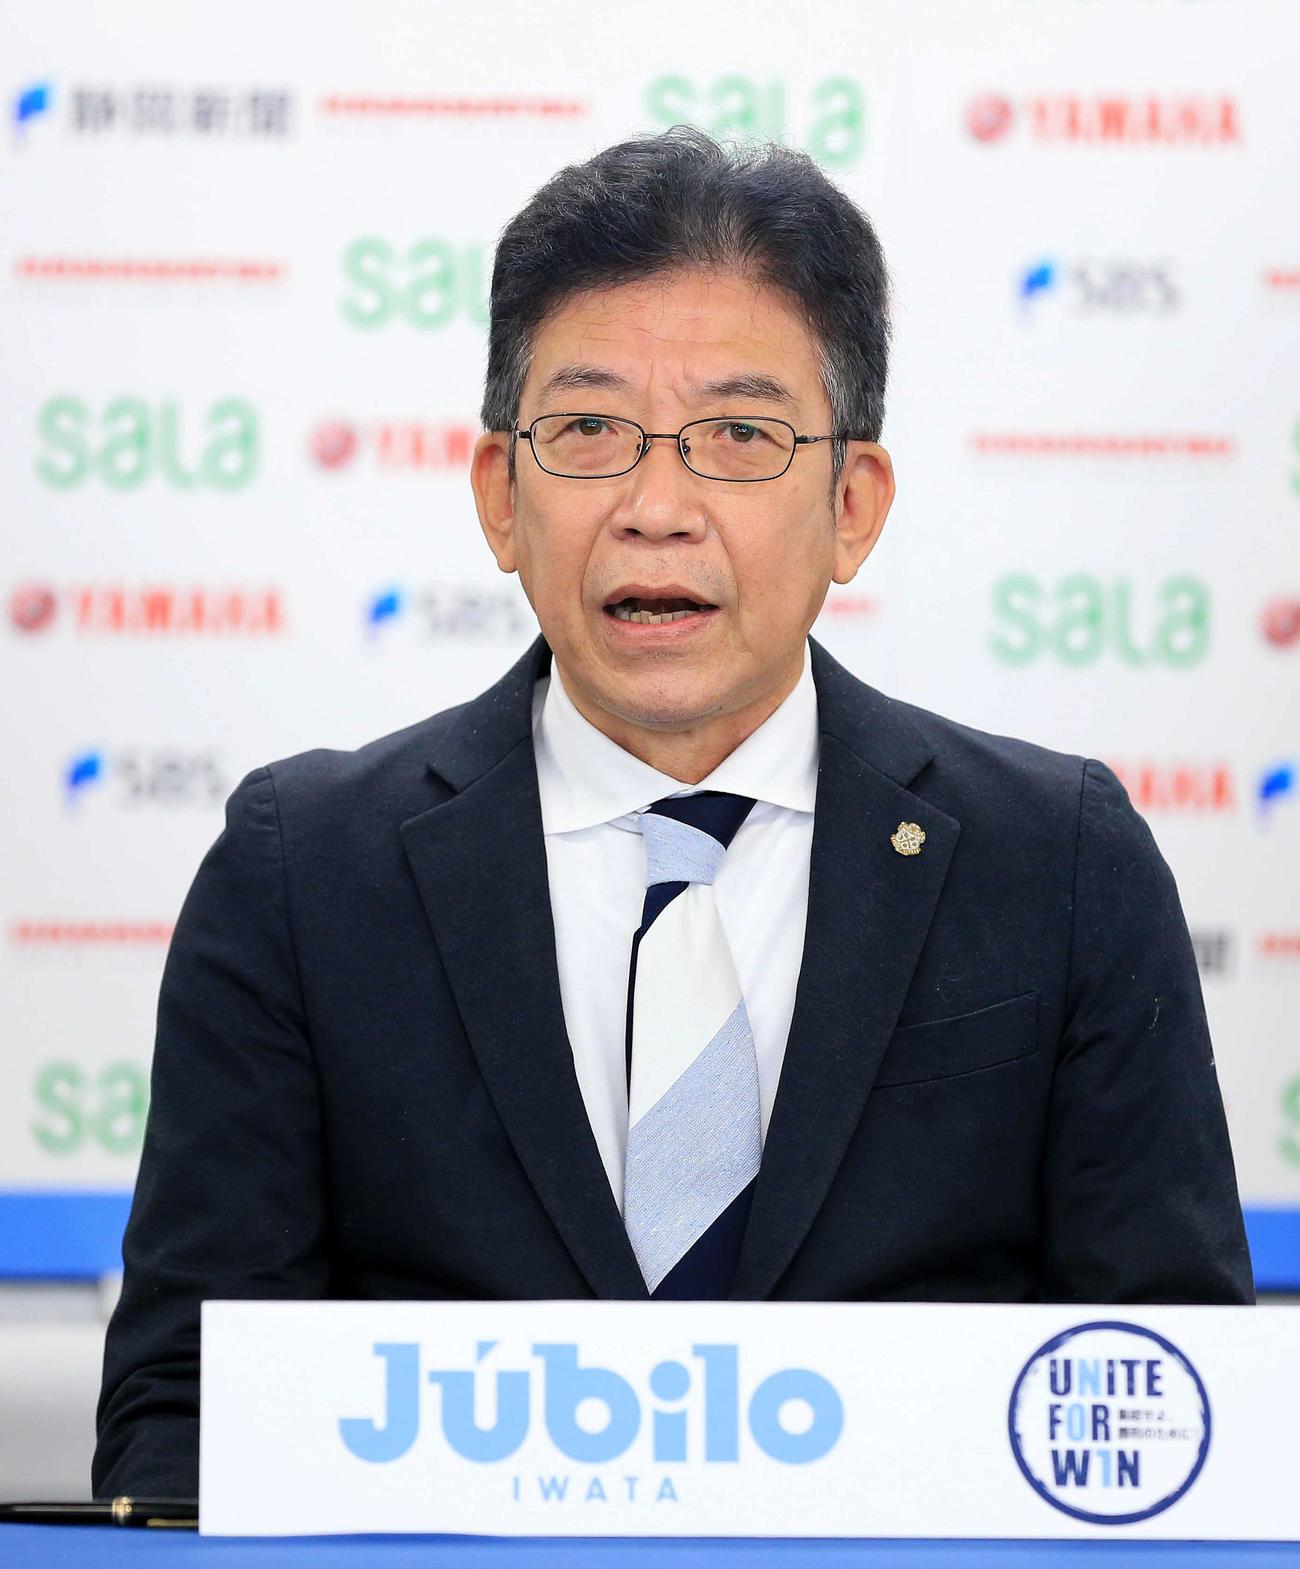 J2優勝でのJ1昇格を誓った磐田の小野社長(C)JUBILO IWATA